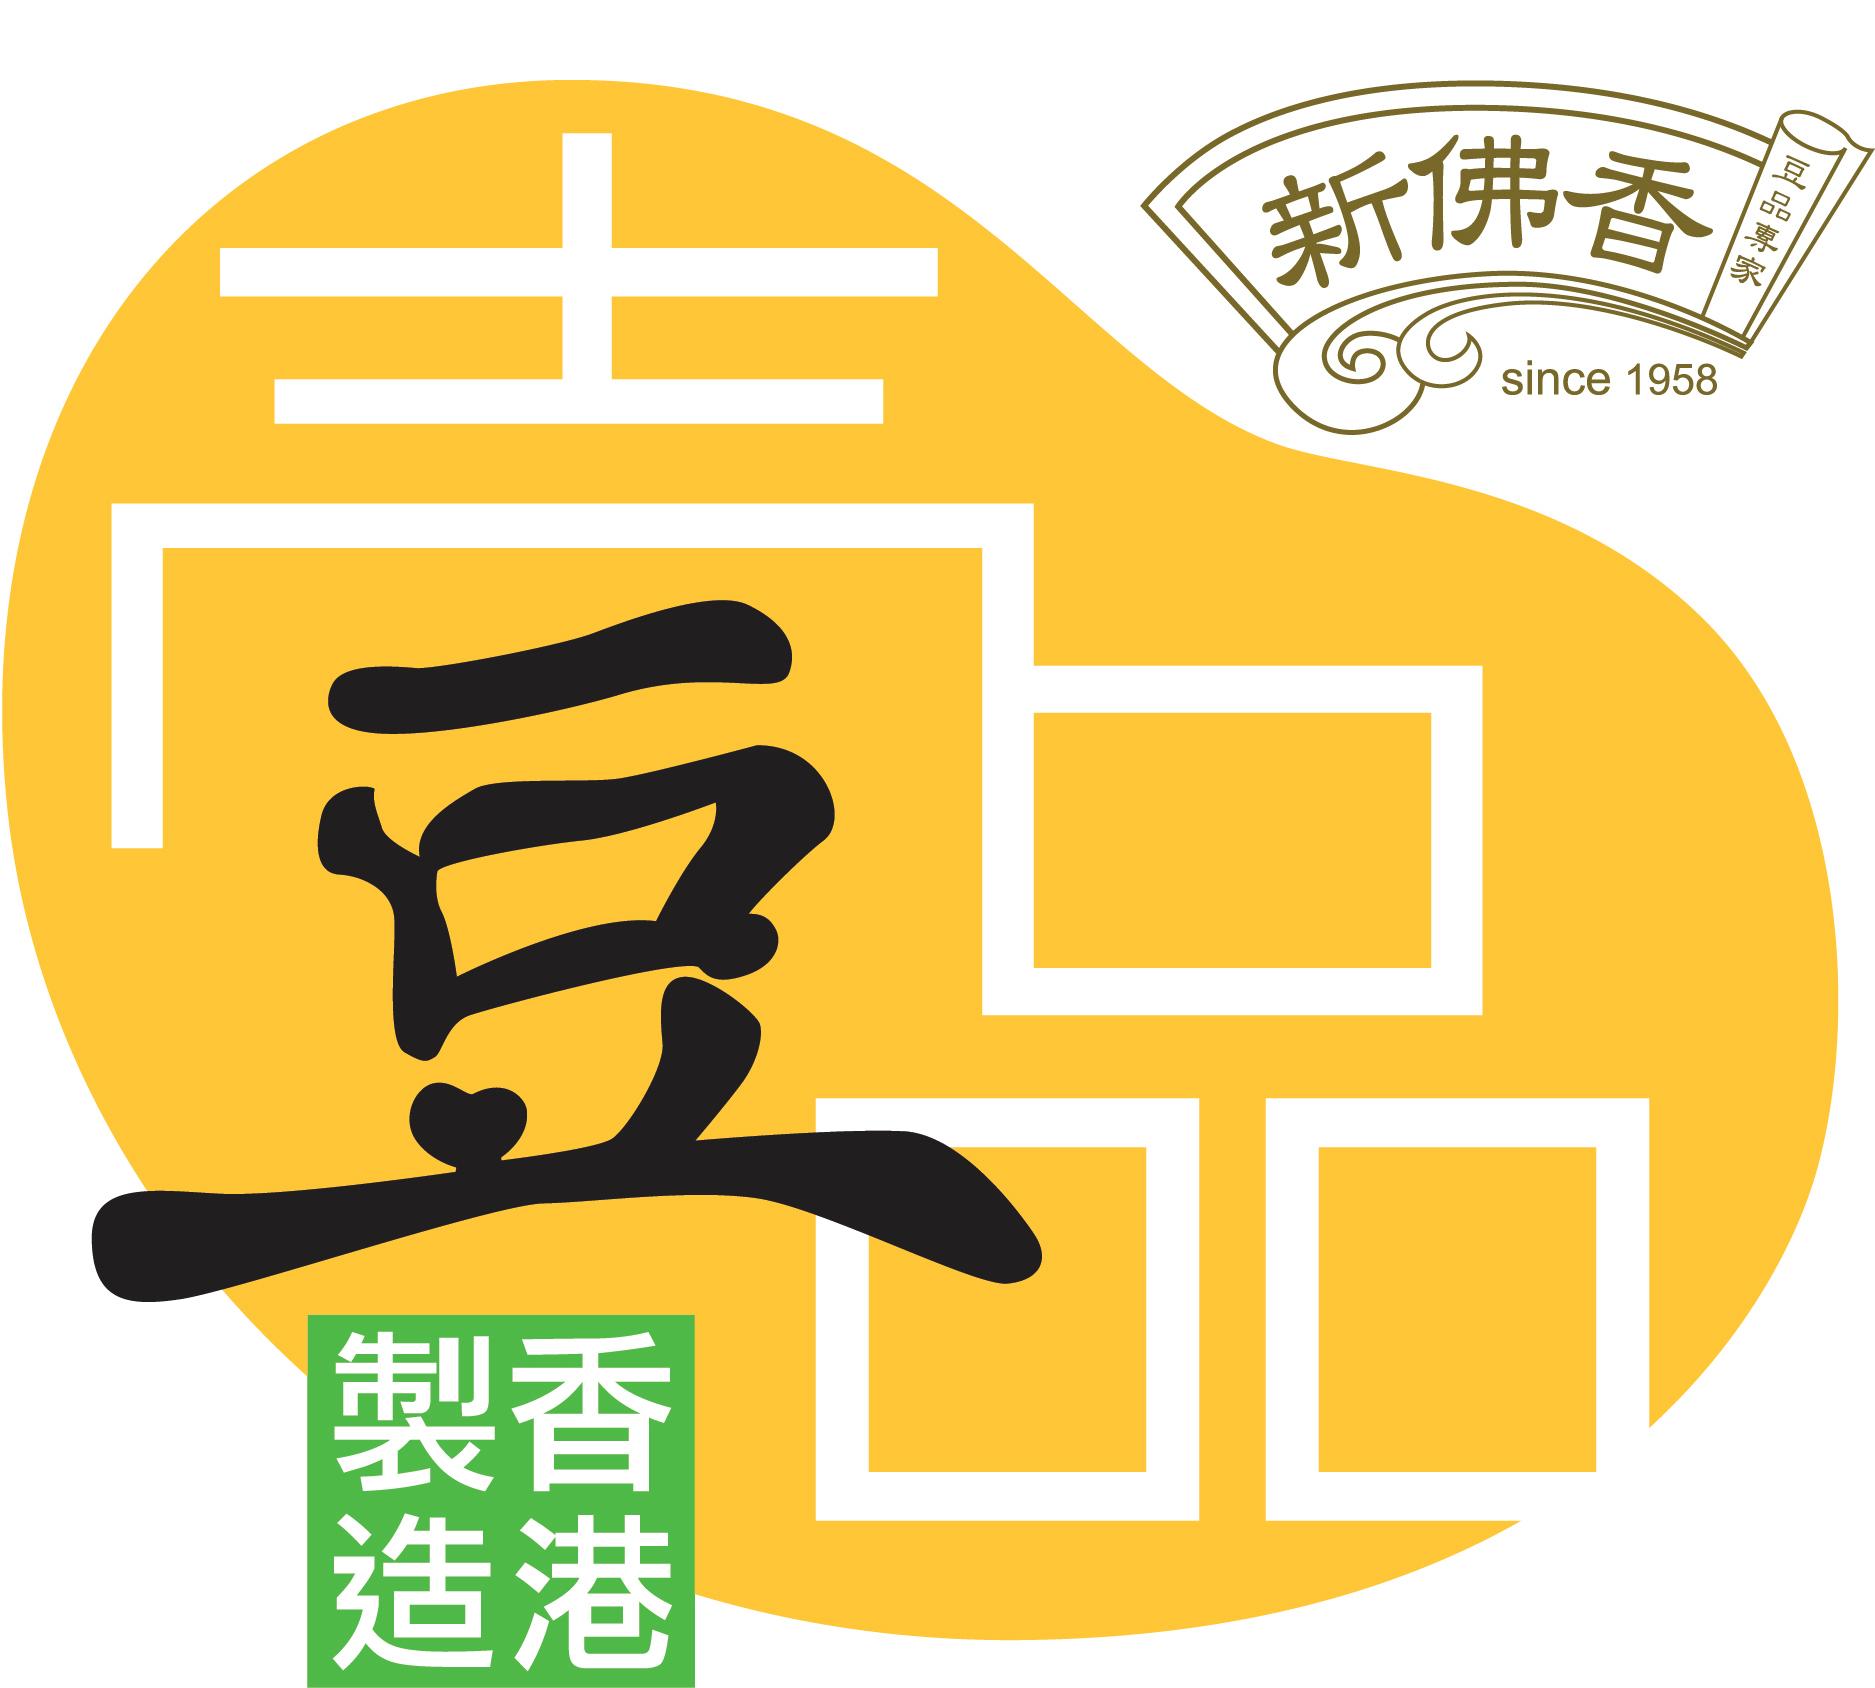 food scheme 2016 silver SunFatHeung